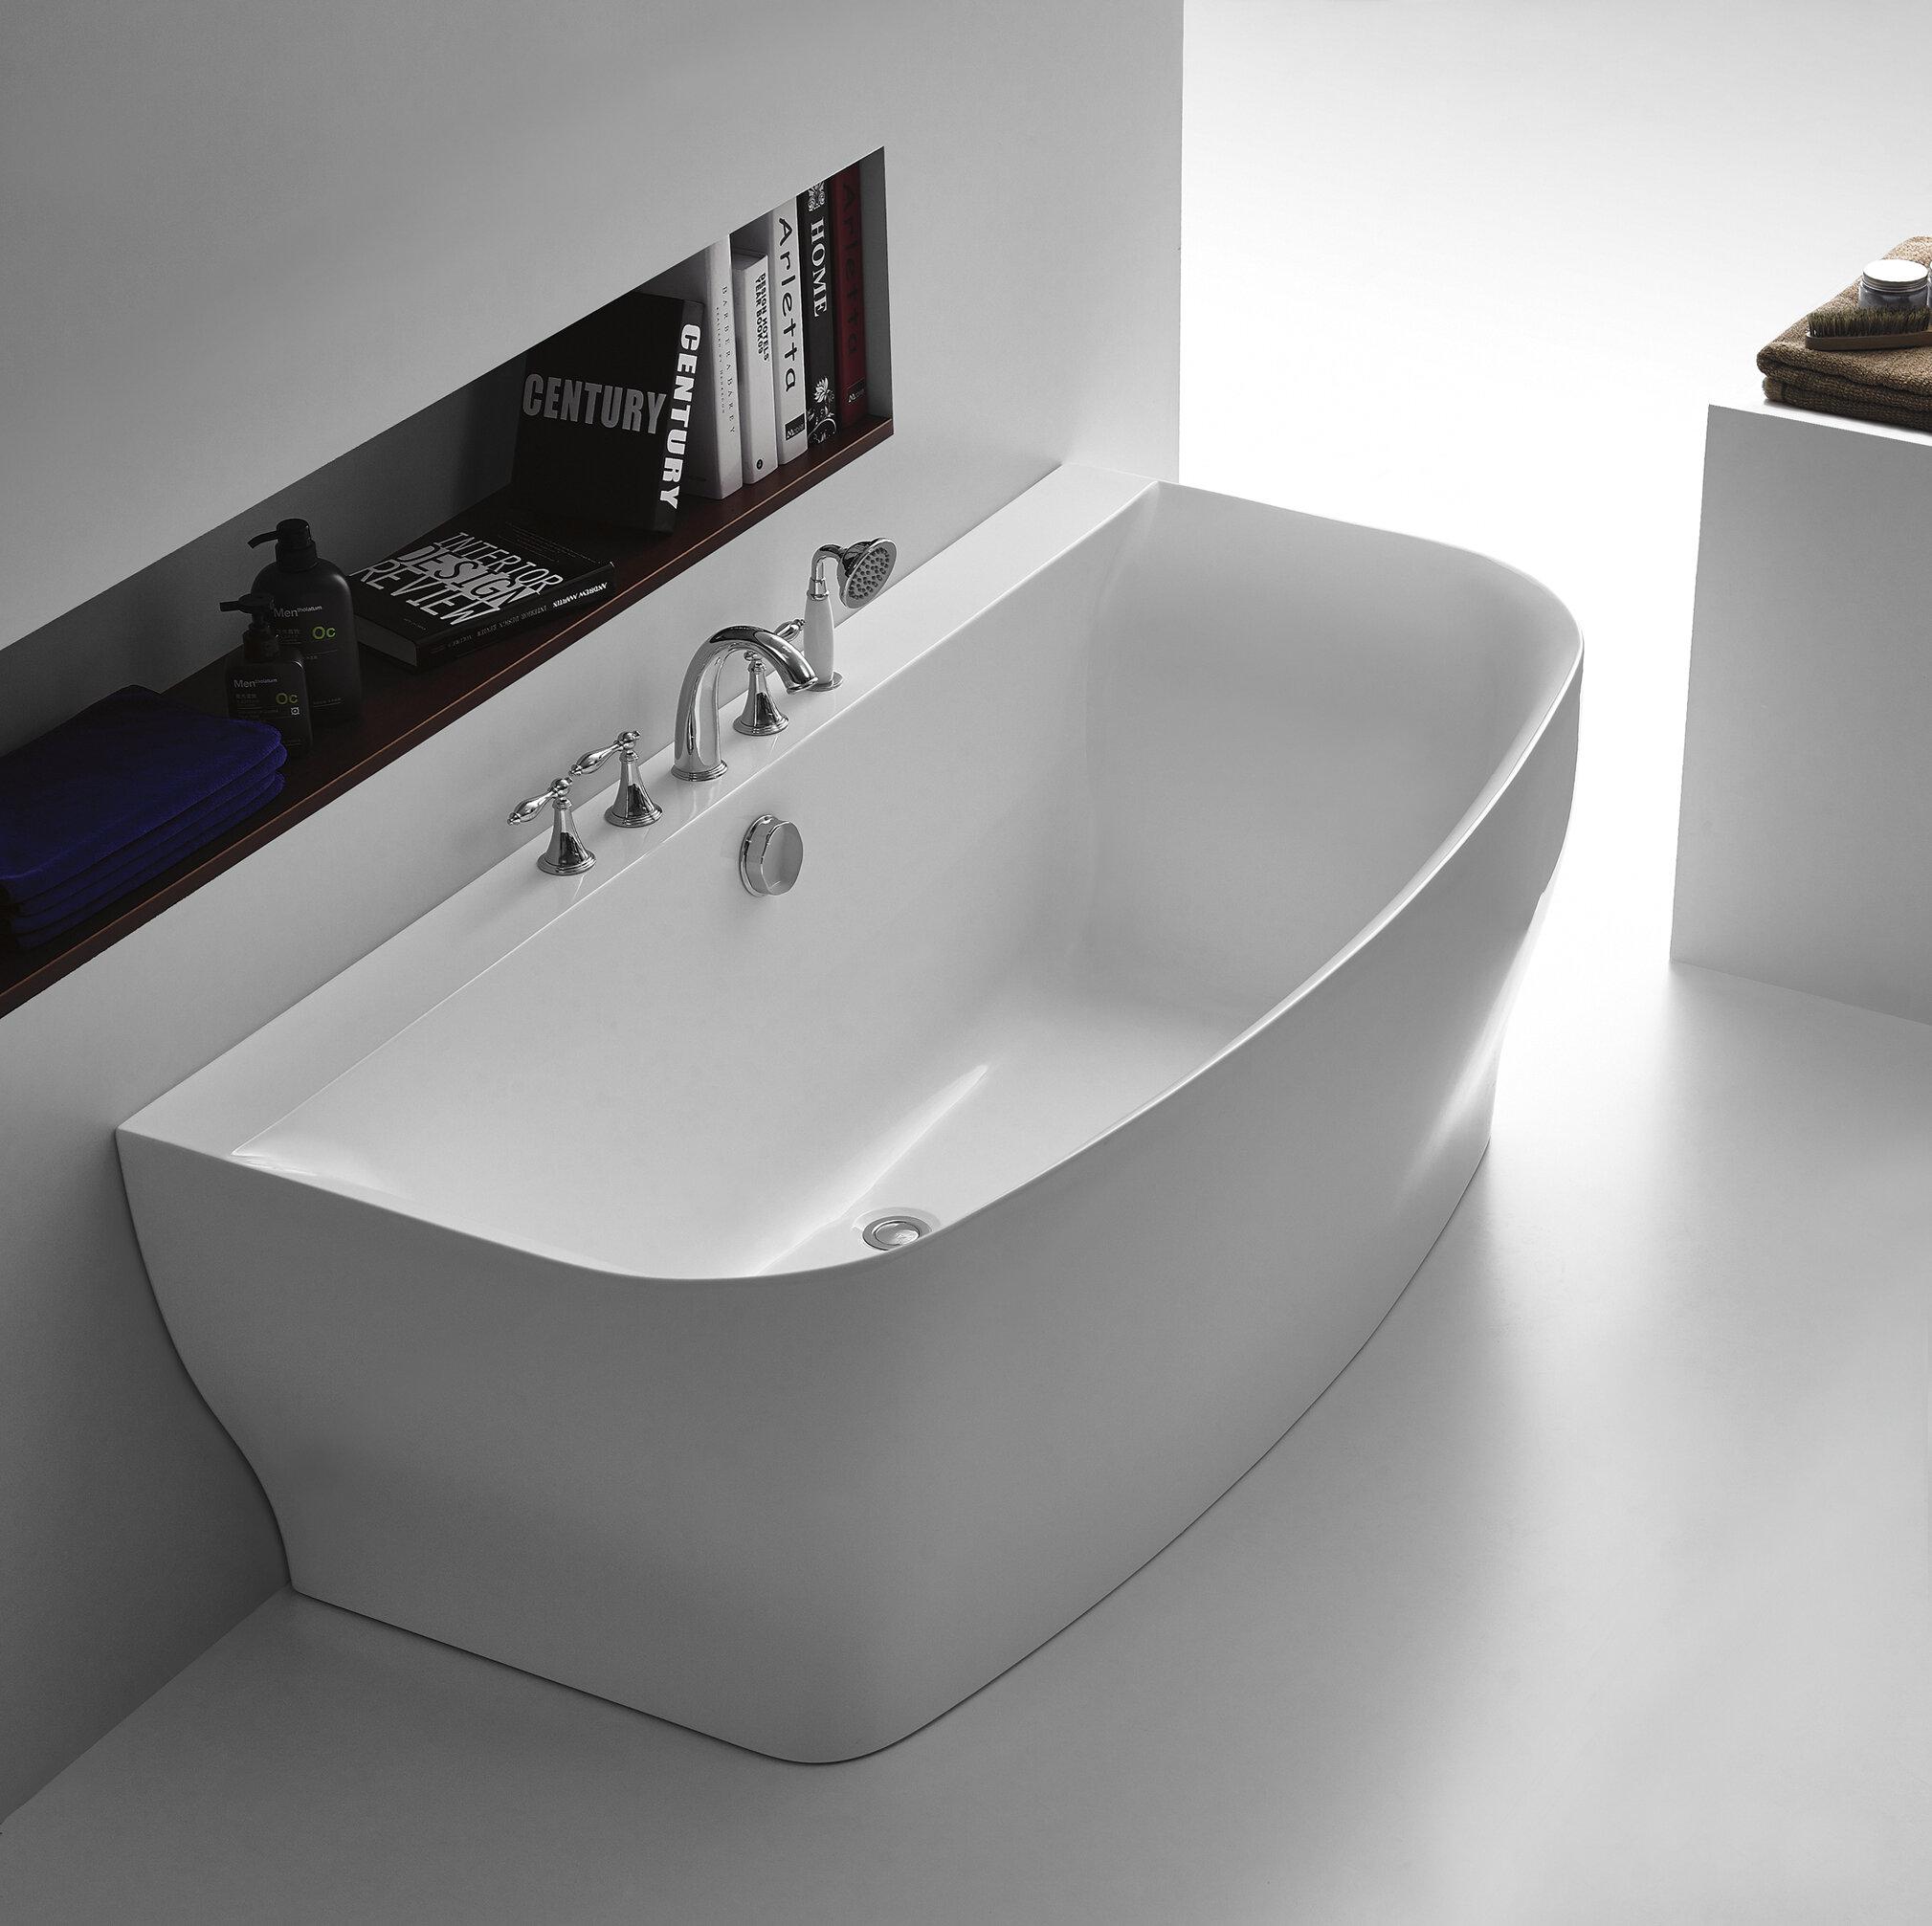 ANZZI Bank Series 65\'\' x 31\'\' Freestanding Soaking Bathtub | Wayfair